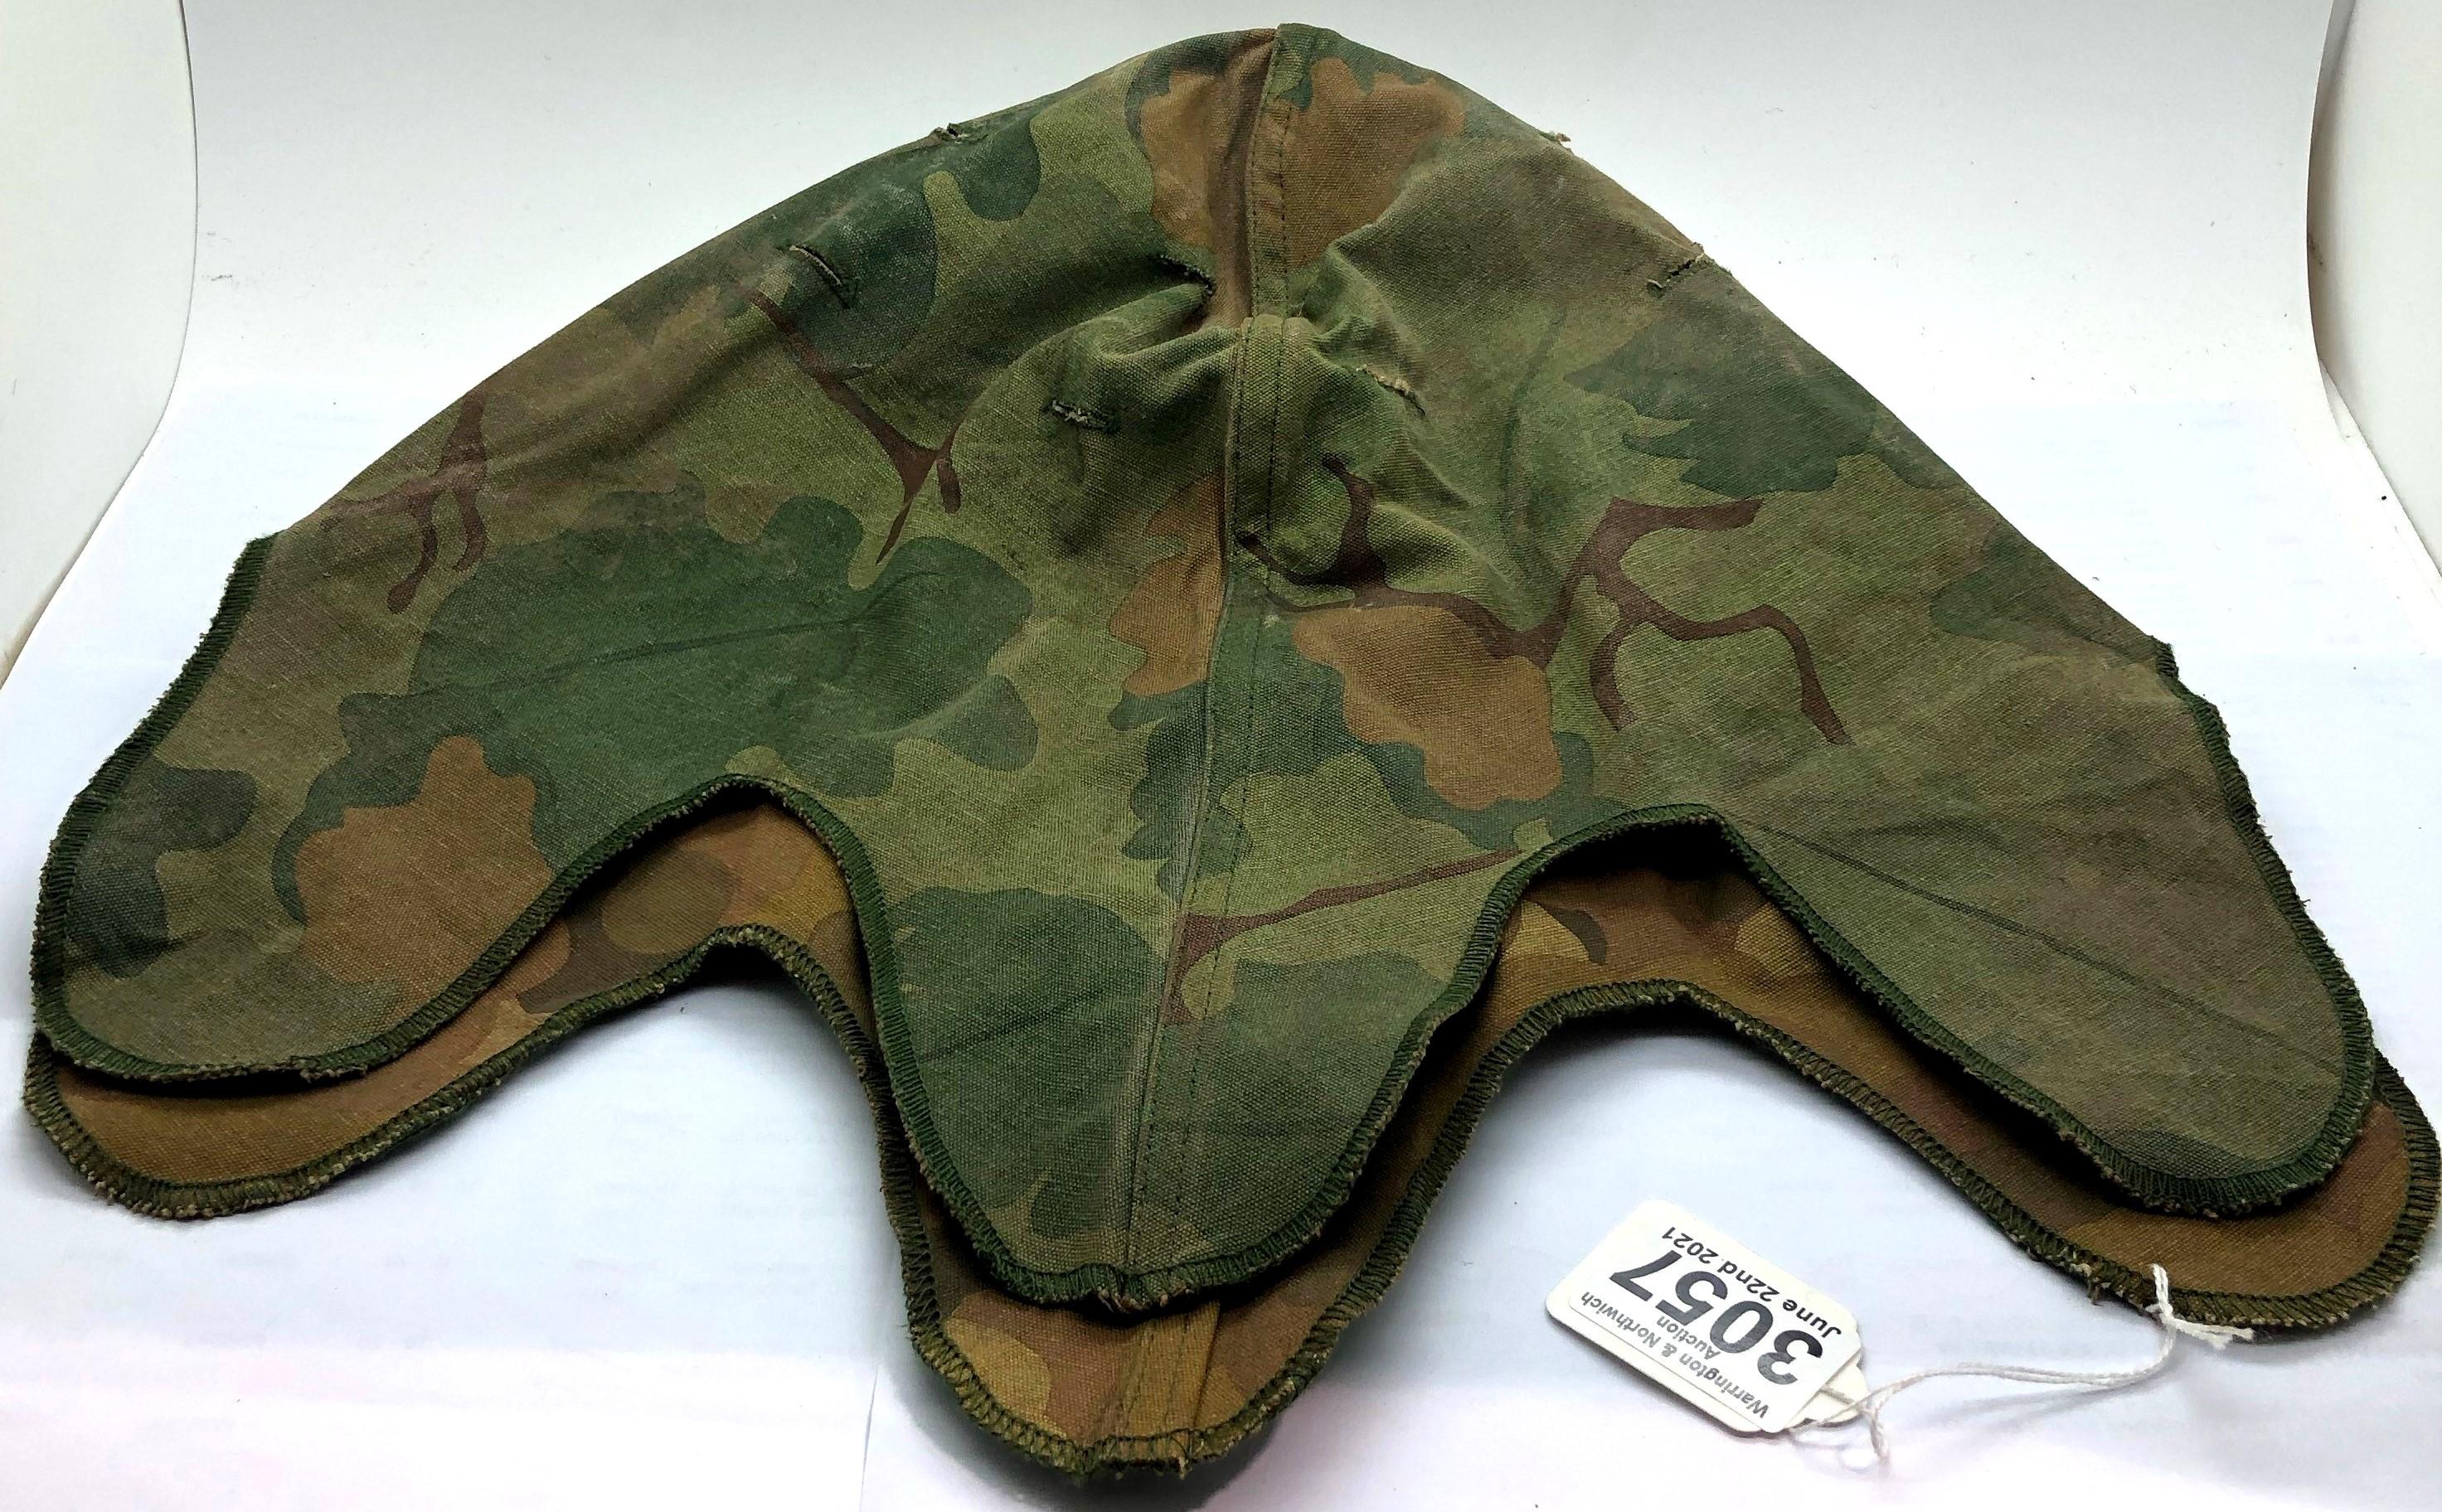 Vietnam War Period US M1 Helmet Reversible Mitch-Duck Hunter Cover. P&P Group 2 (£18+VAT for the